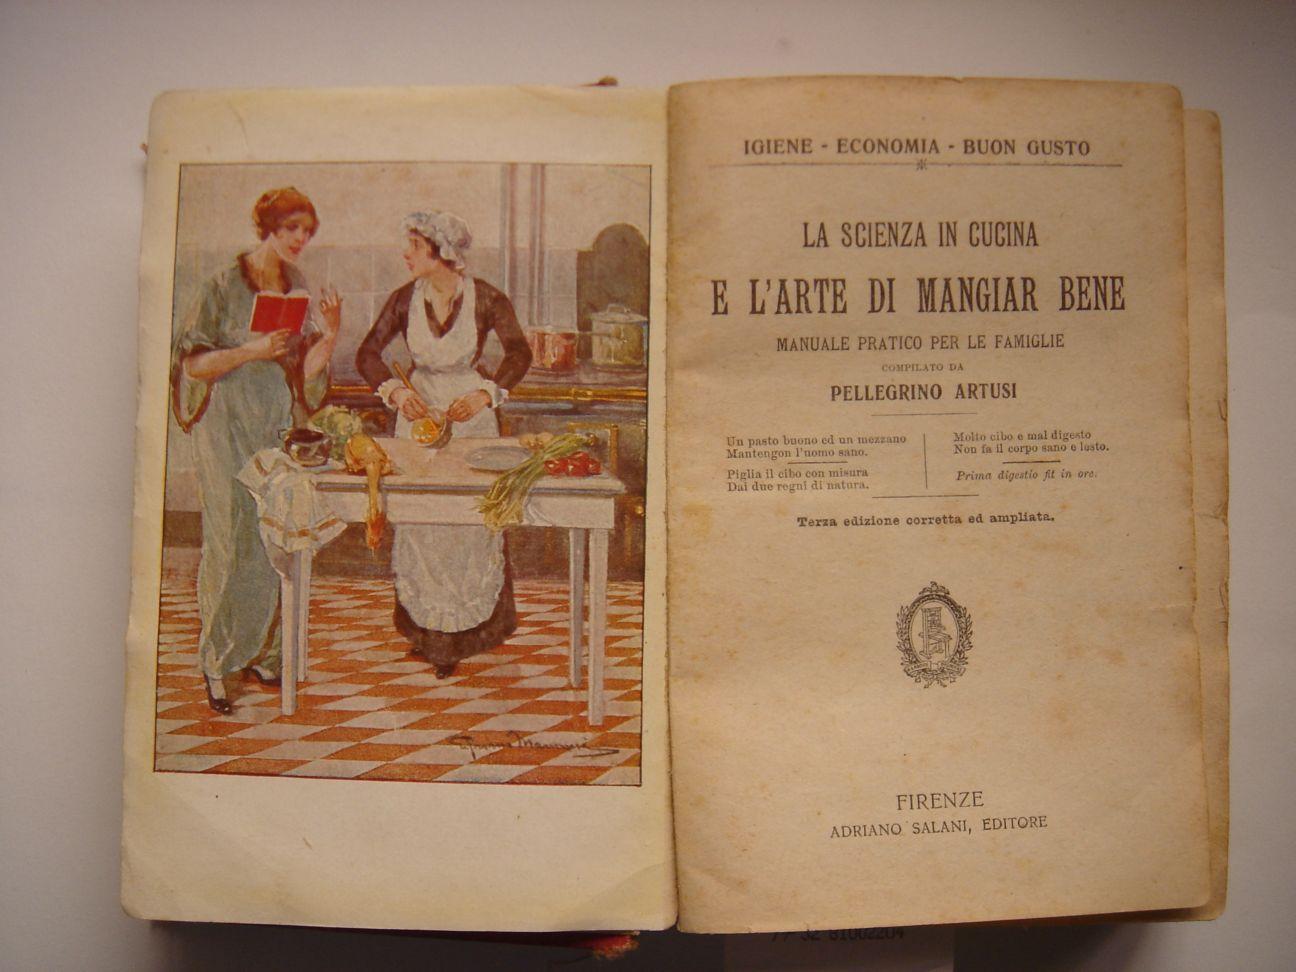 Dolci Ricette La Scienza In Cucina E L 39 Arte Di Mangiar Bene